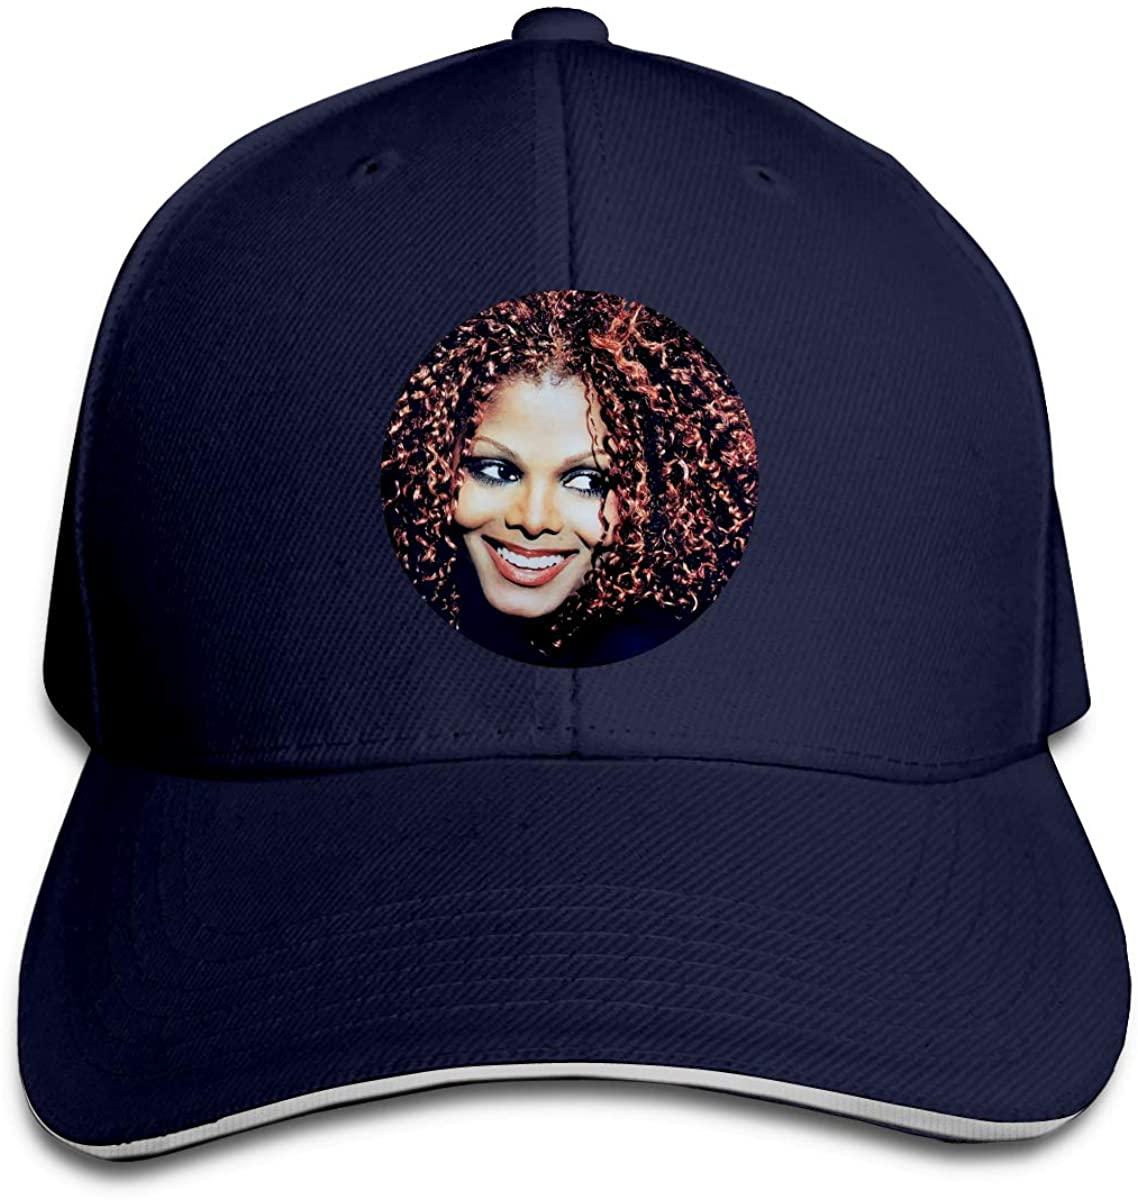 Janet Jackson Hip Hop Baseball Cap Golf Trucker Baseball Cap Adjustable Peaked Sandwich Hat Black Unisex Casquette Natural